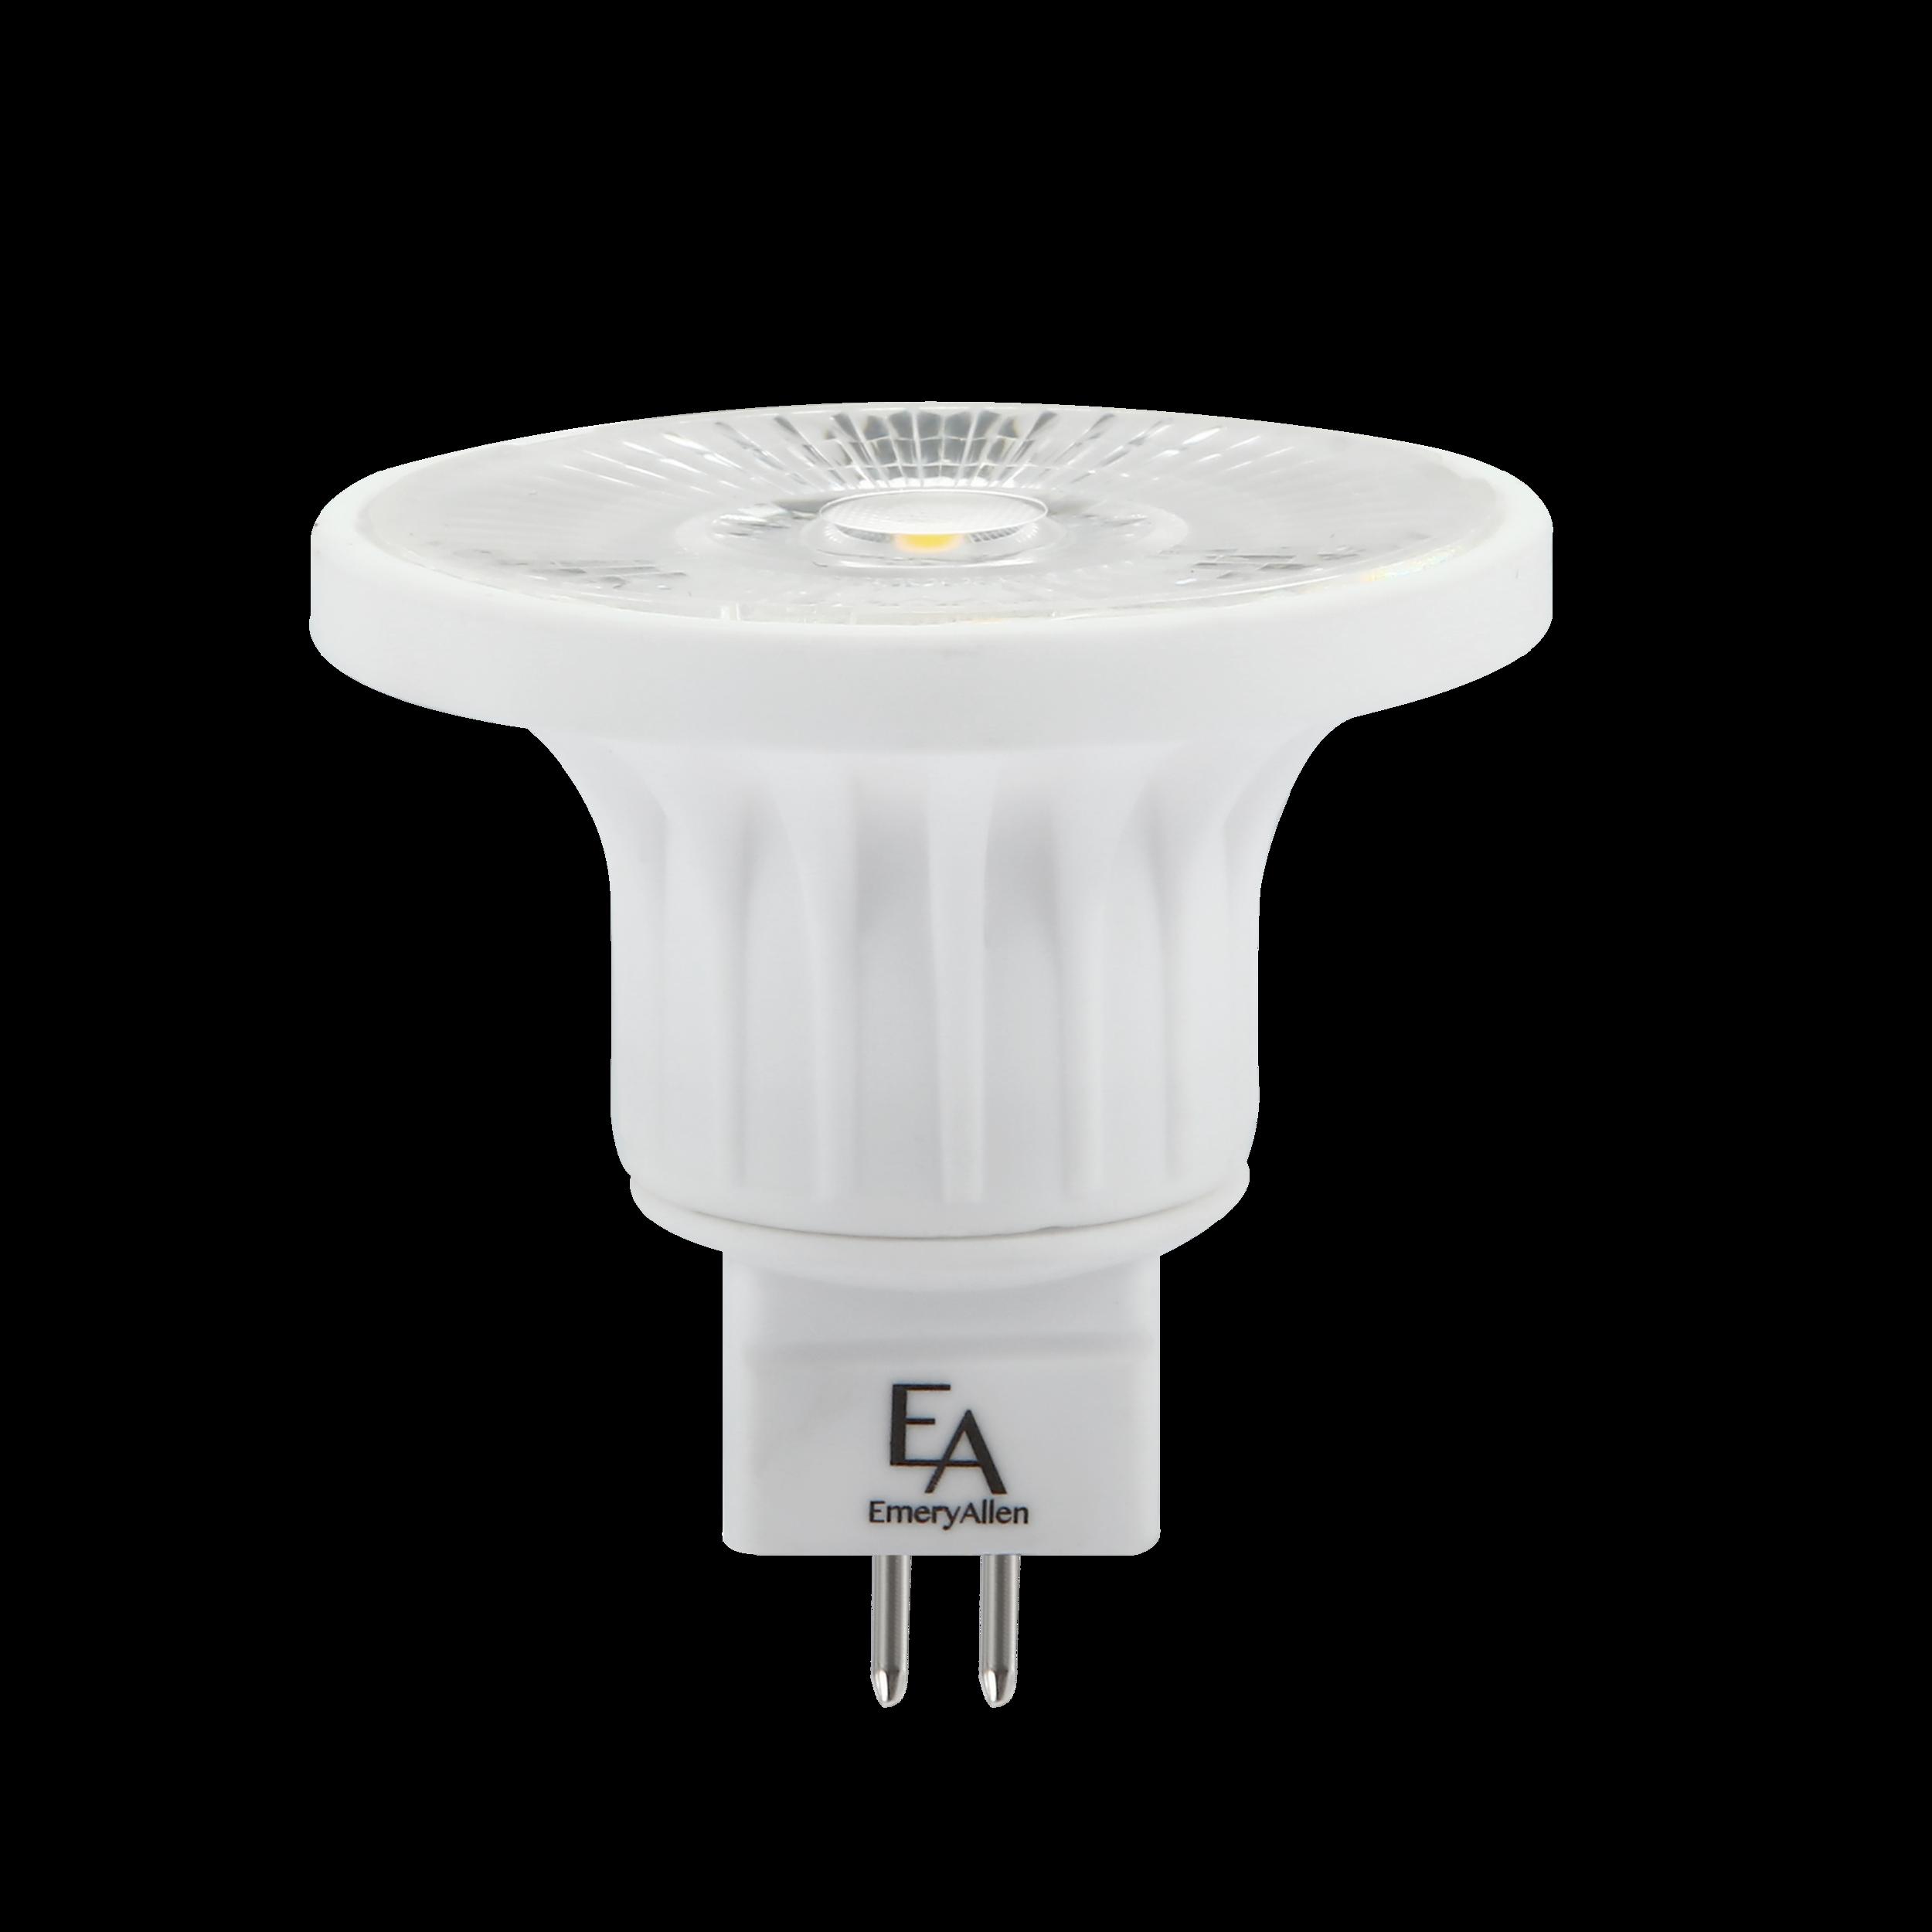 3.0 W - 270 - 310 lumens